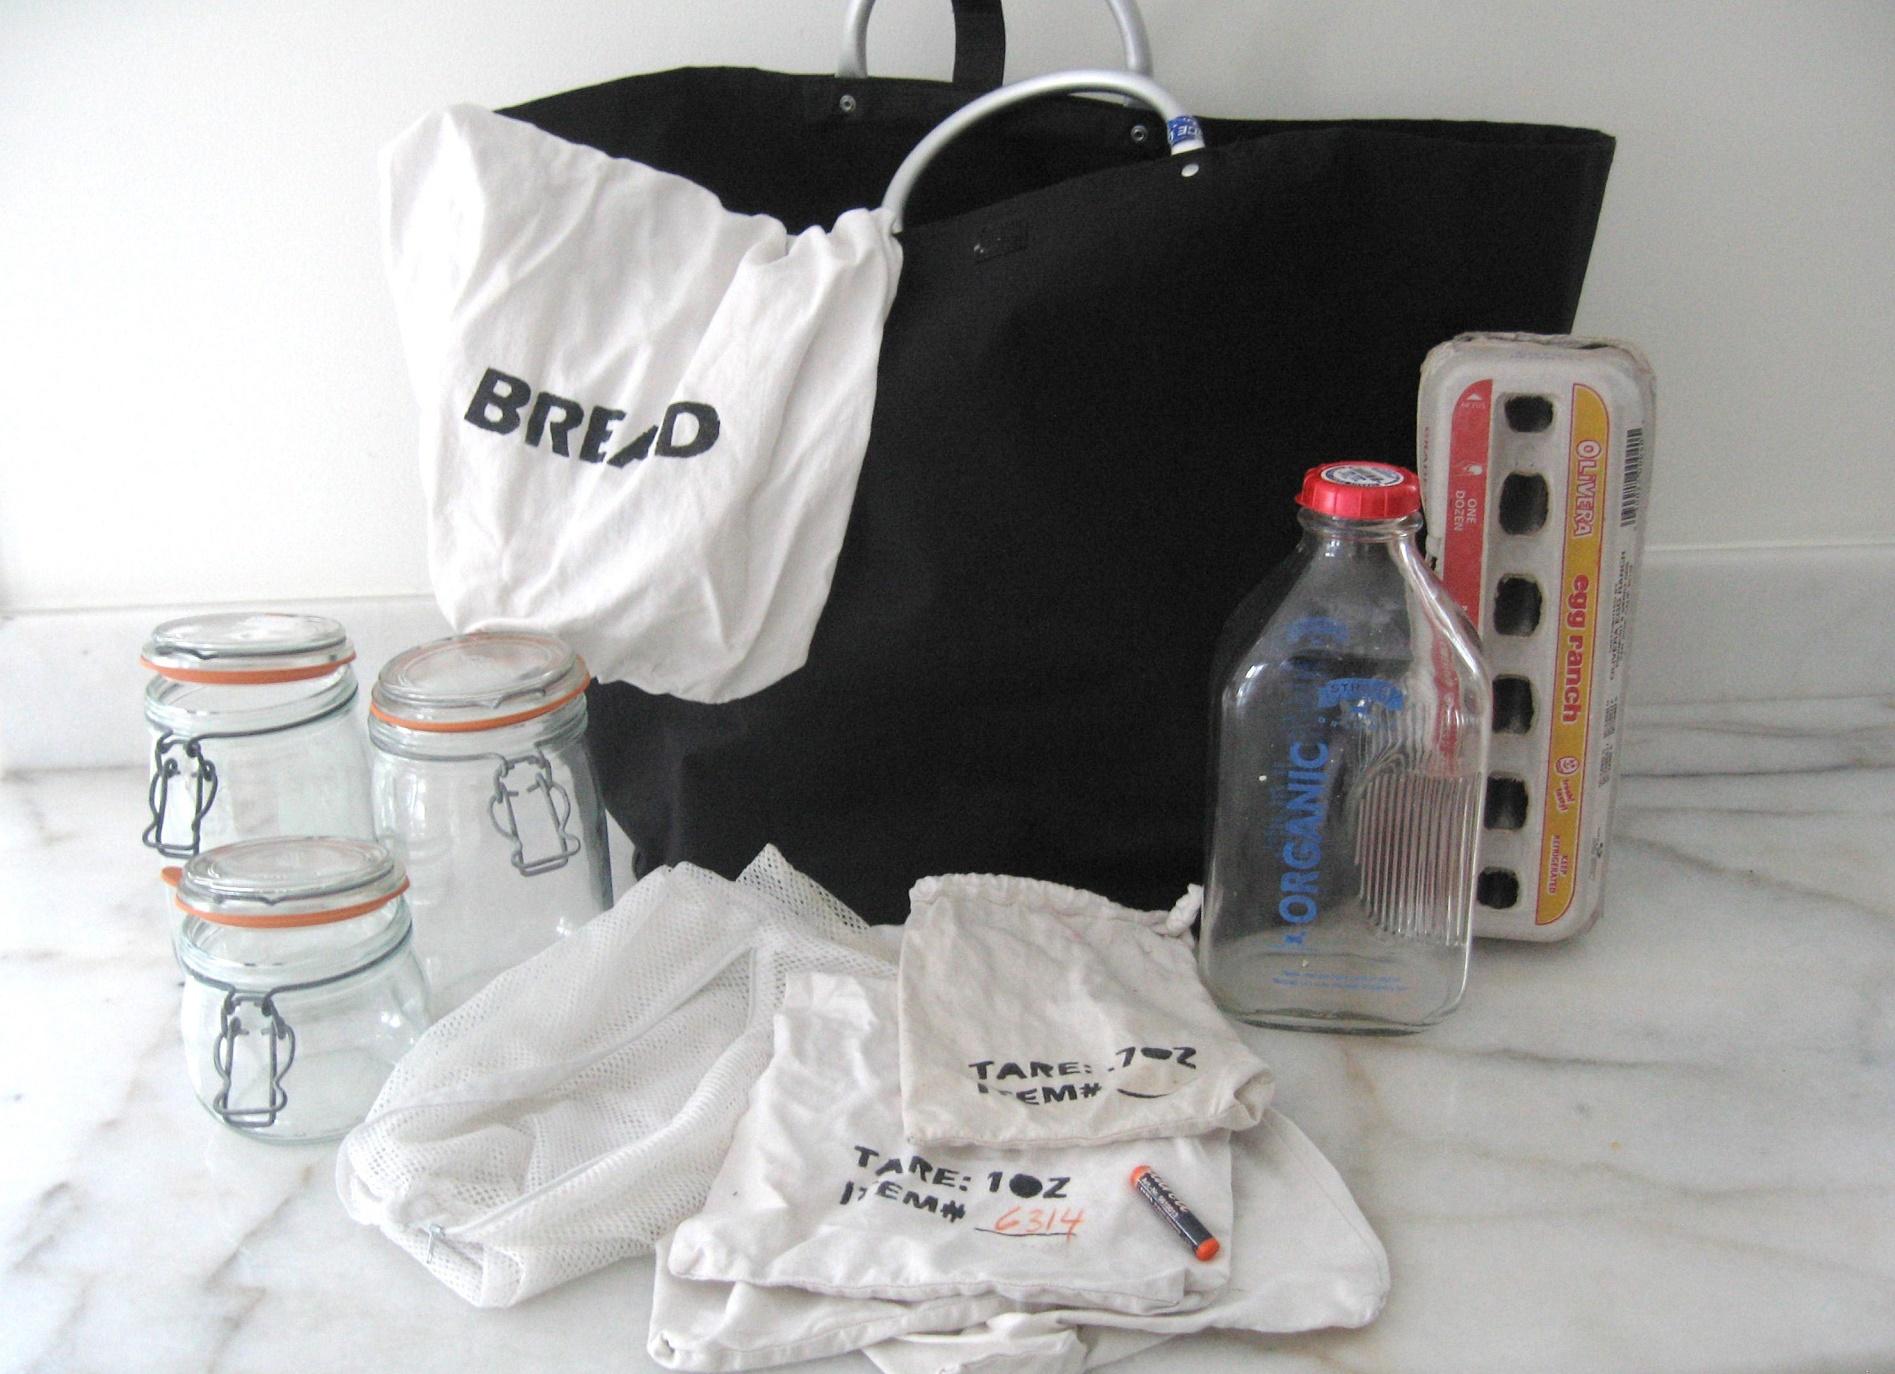 Kid de compras: supermercado sem saco plástico